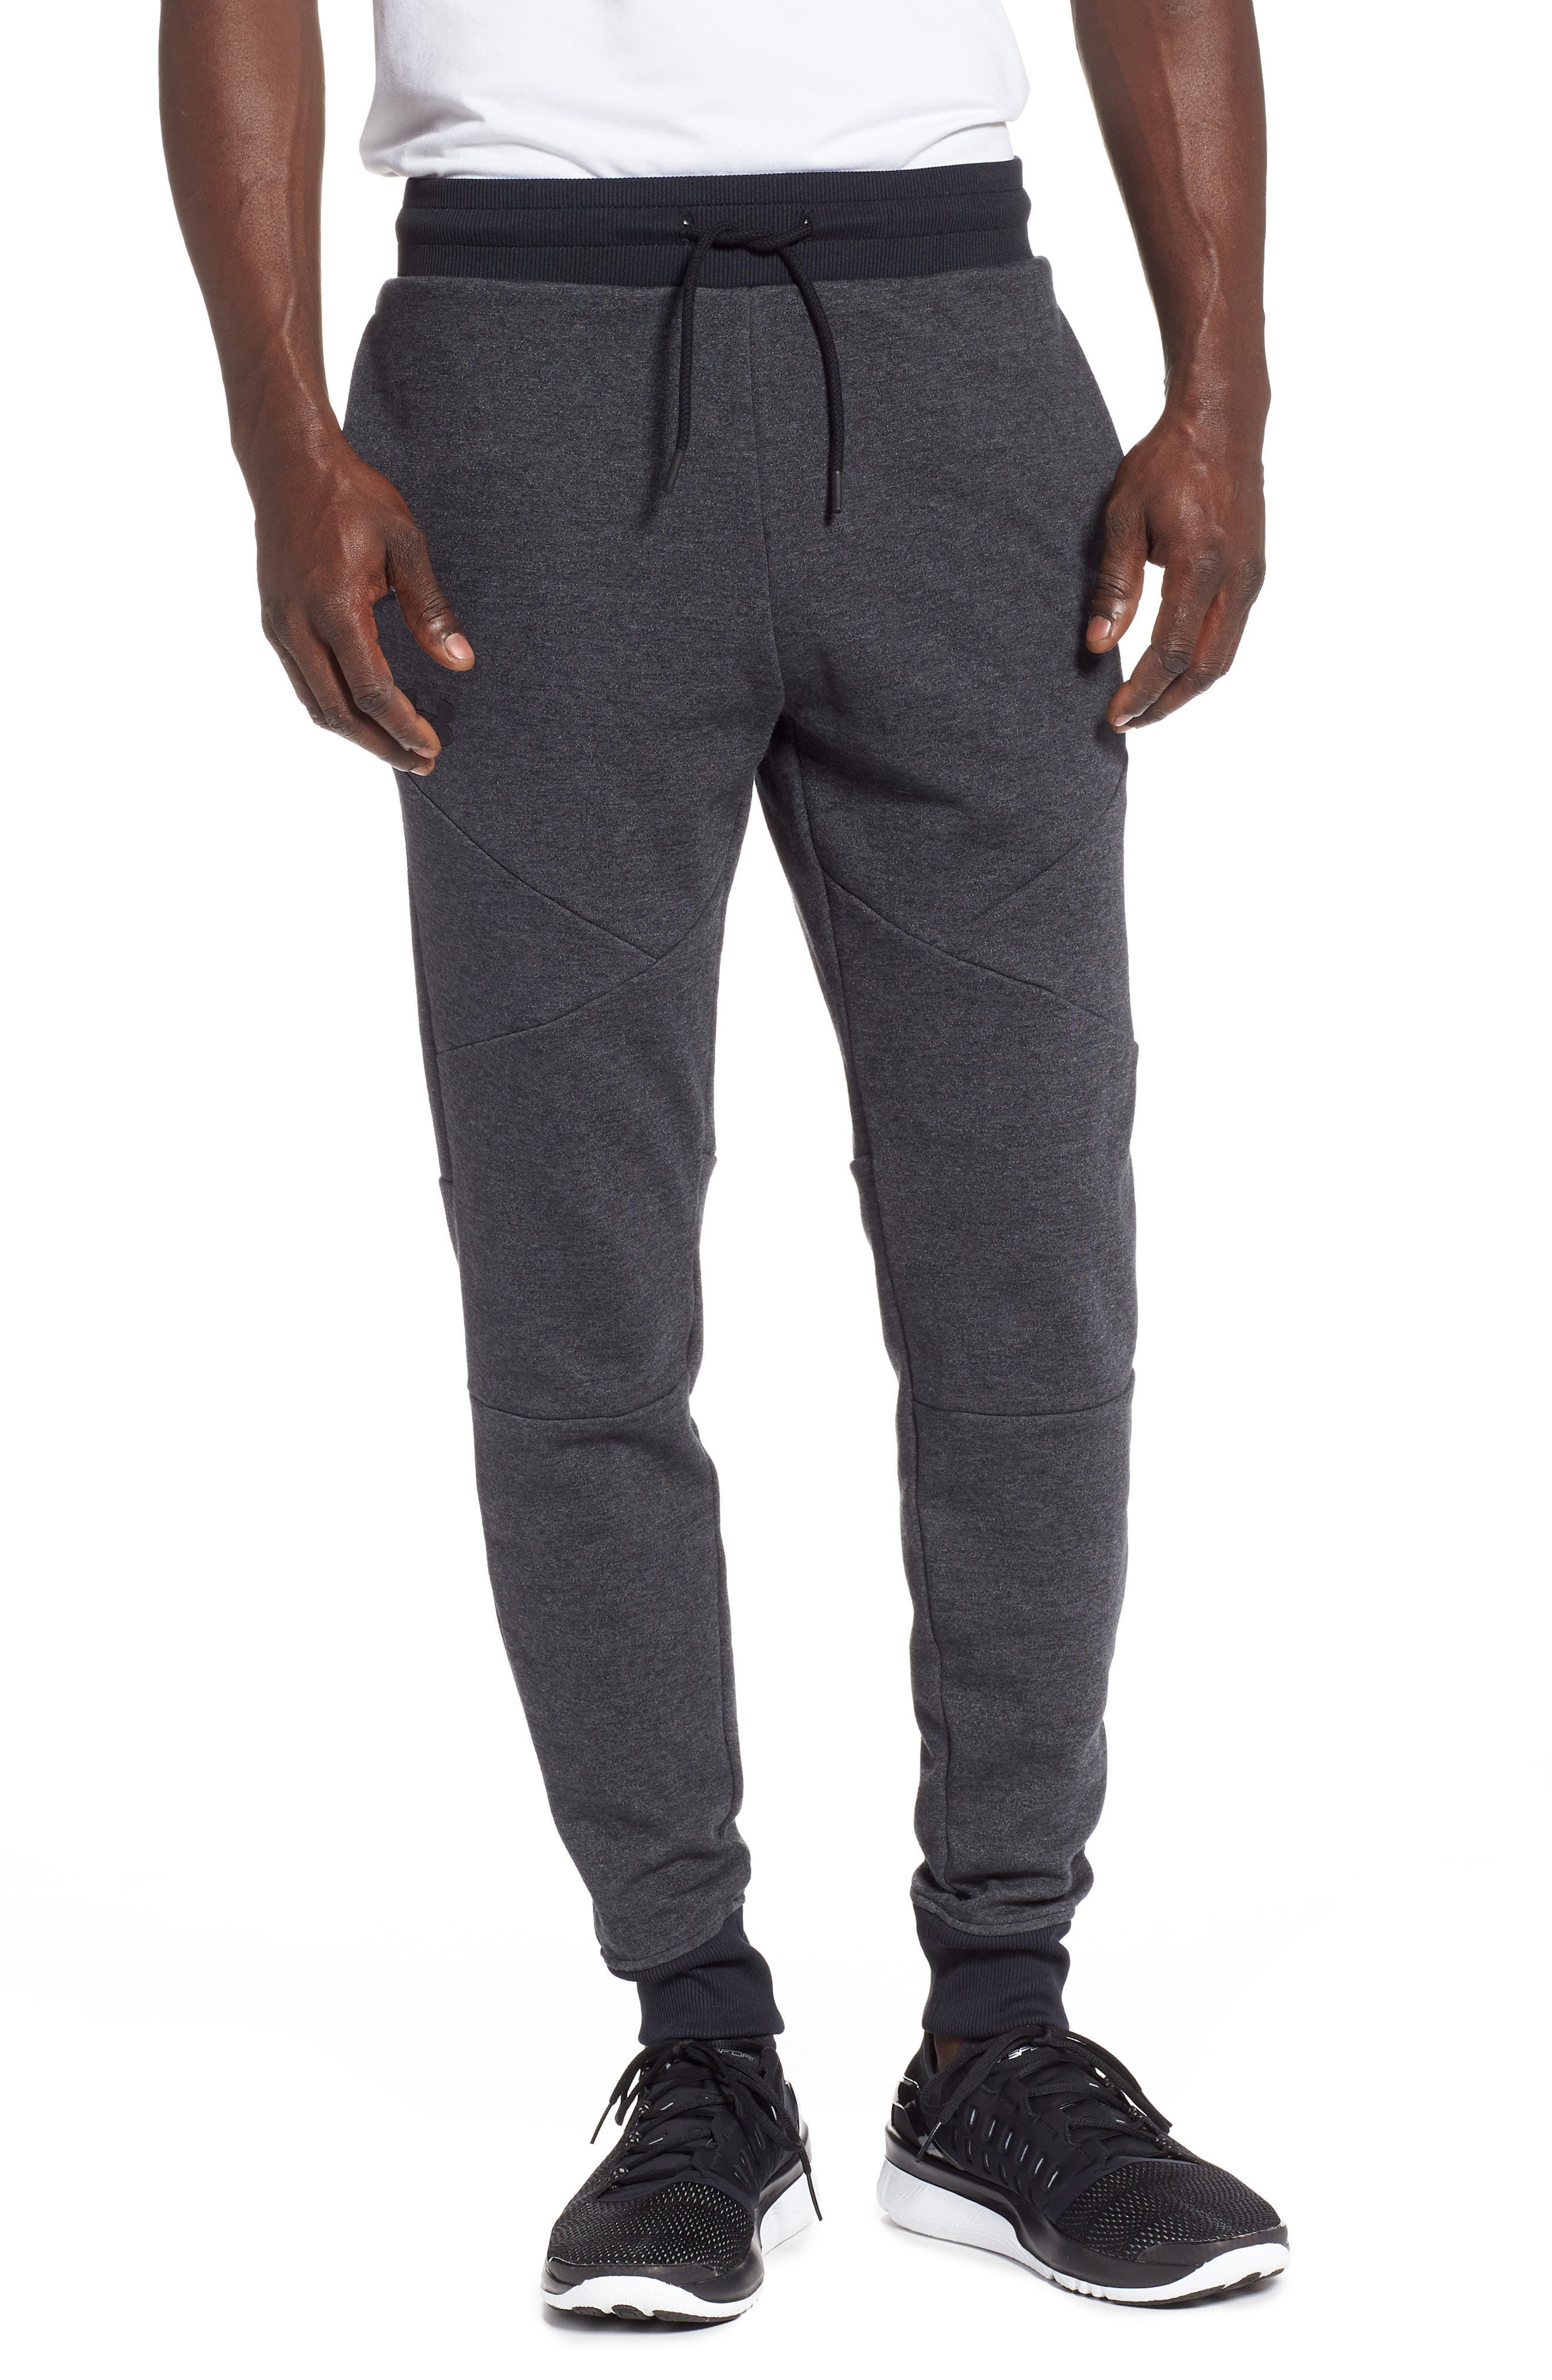 UNDER ARMOUR Unstoppable Double Knit Jogger Pants, Main, color, 001